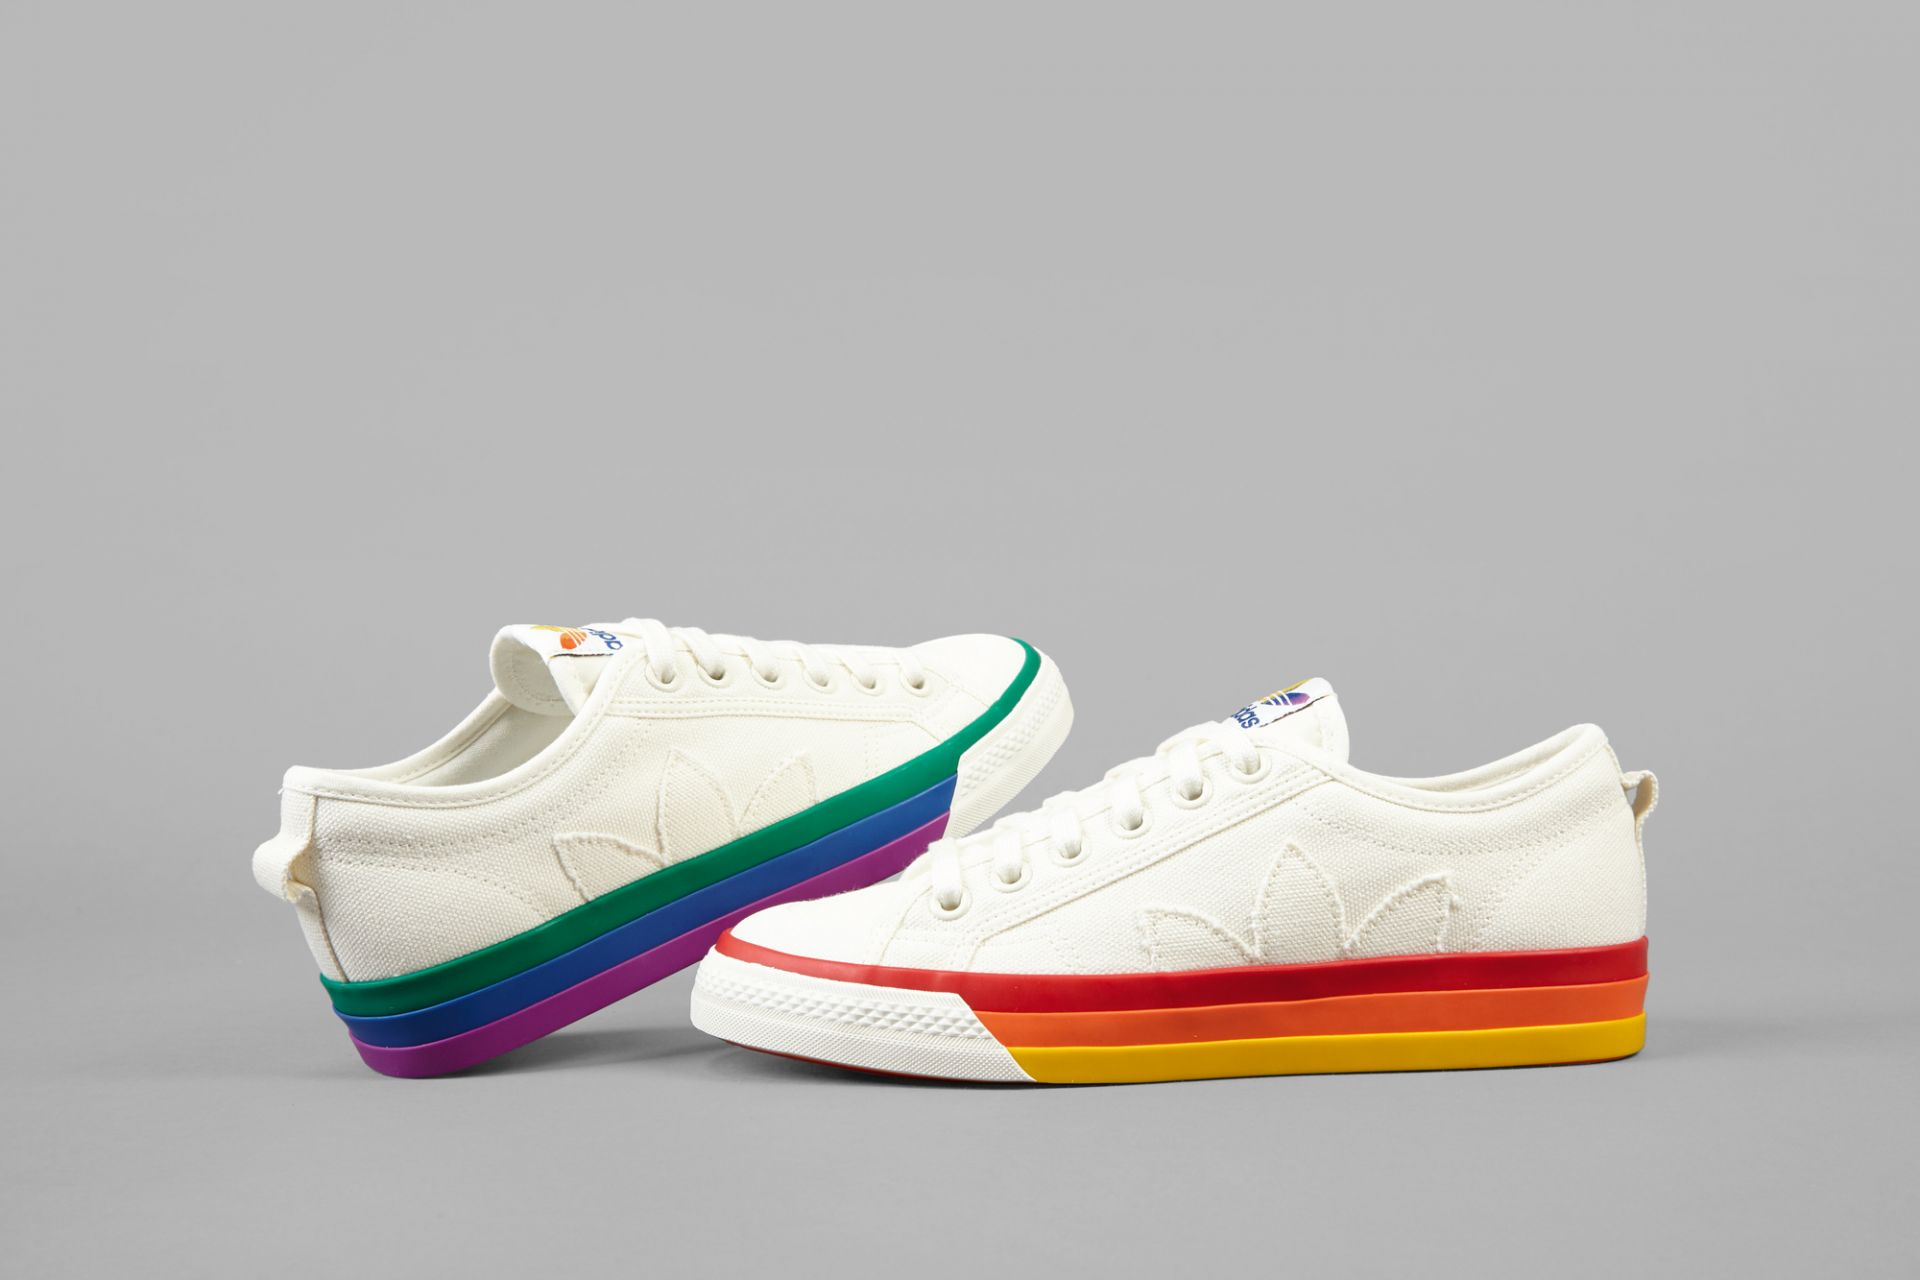 Sneakers, Nizza Pride, adidas, Herzogenaurach, 2019